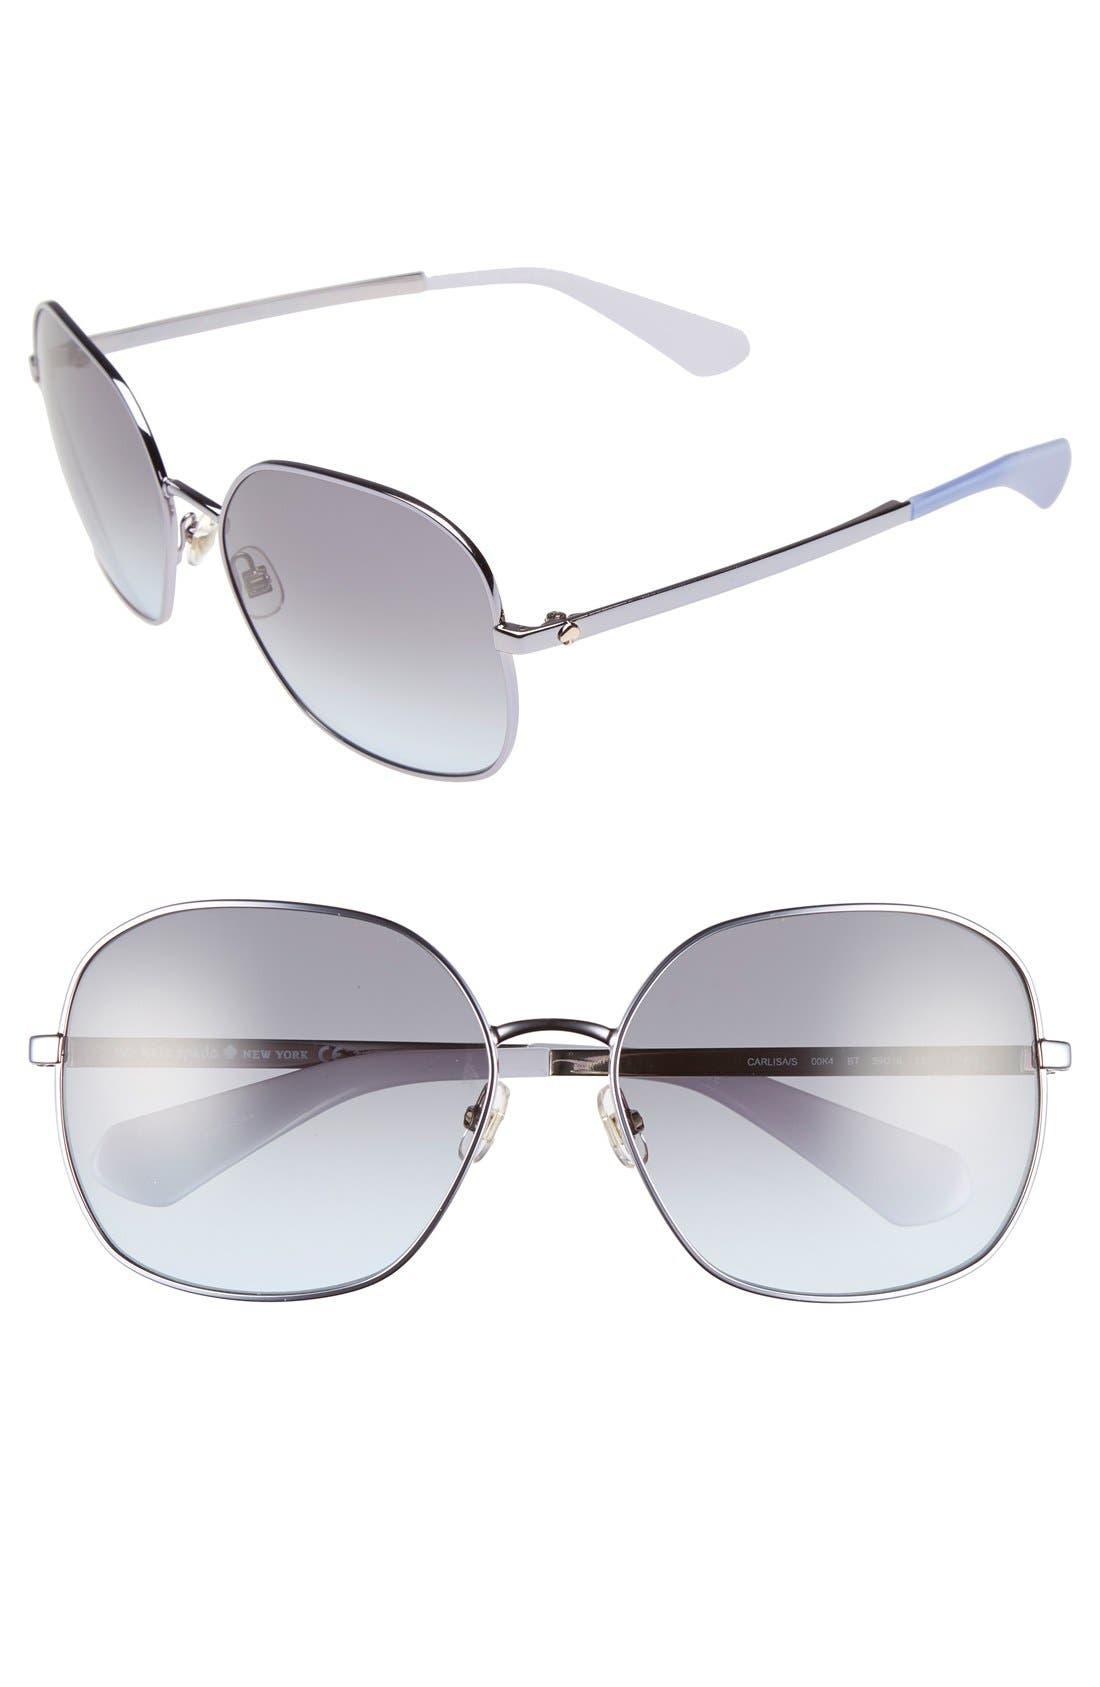 kate spade new york 'carlisa' 59mm sunglasses